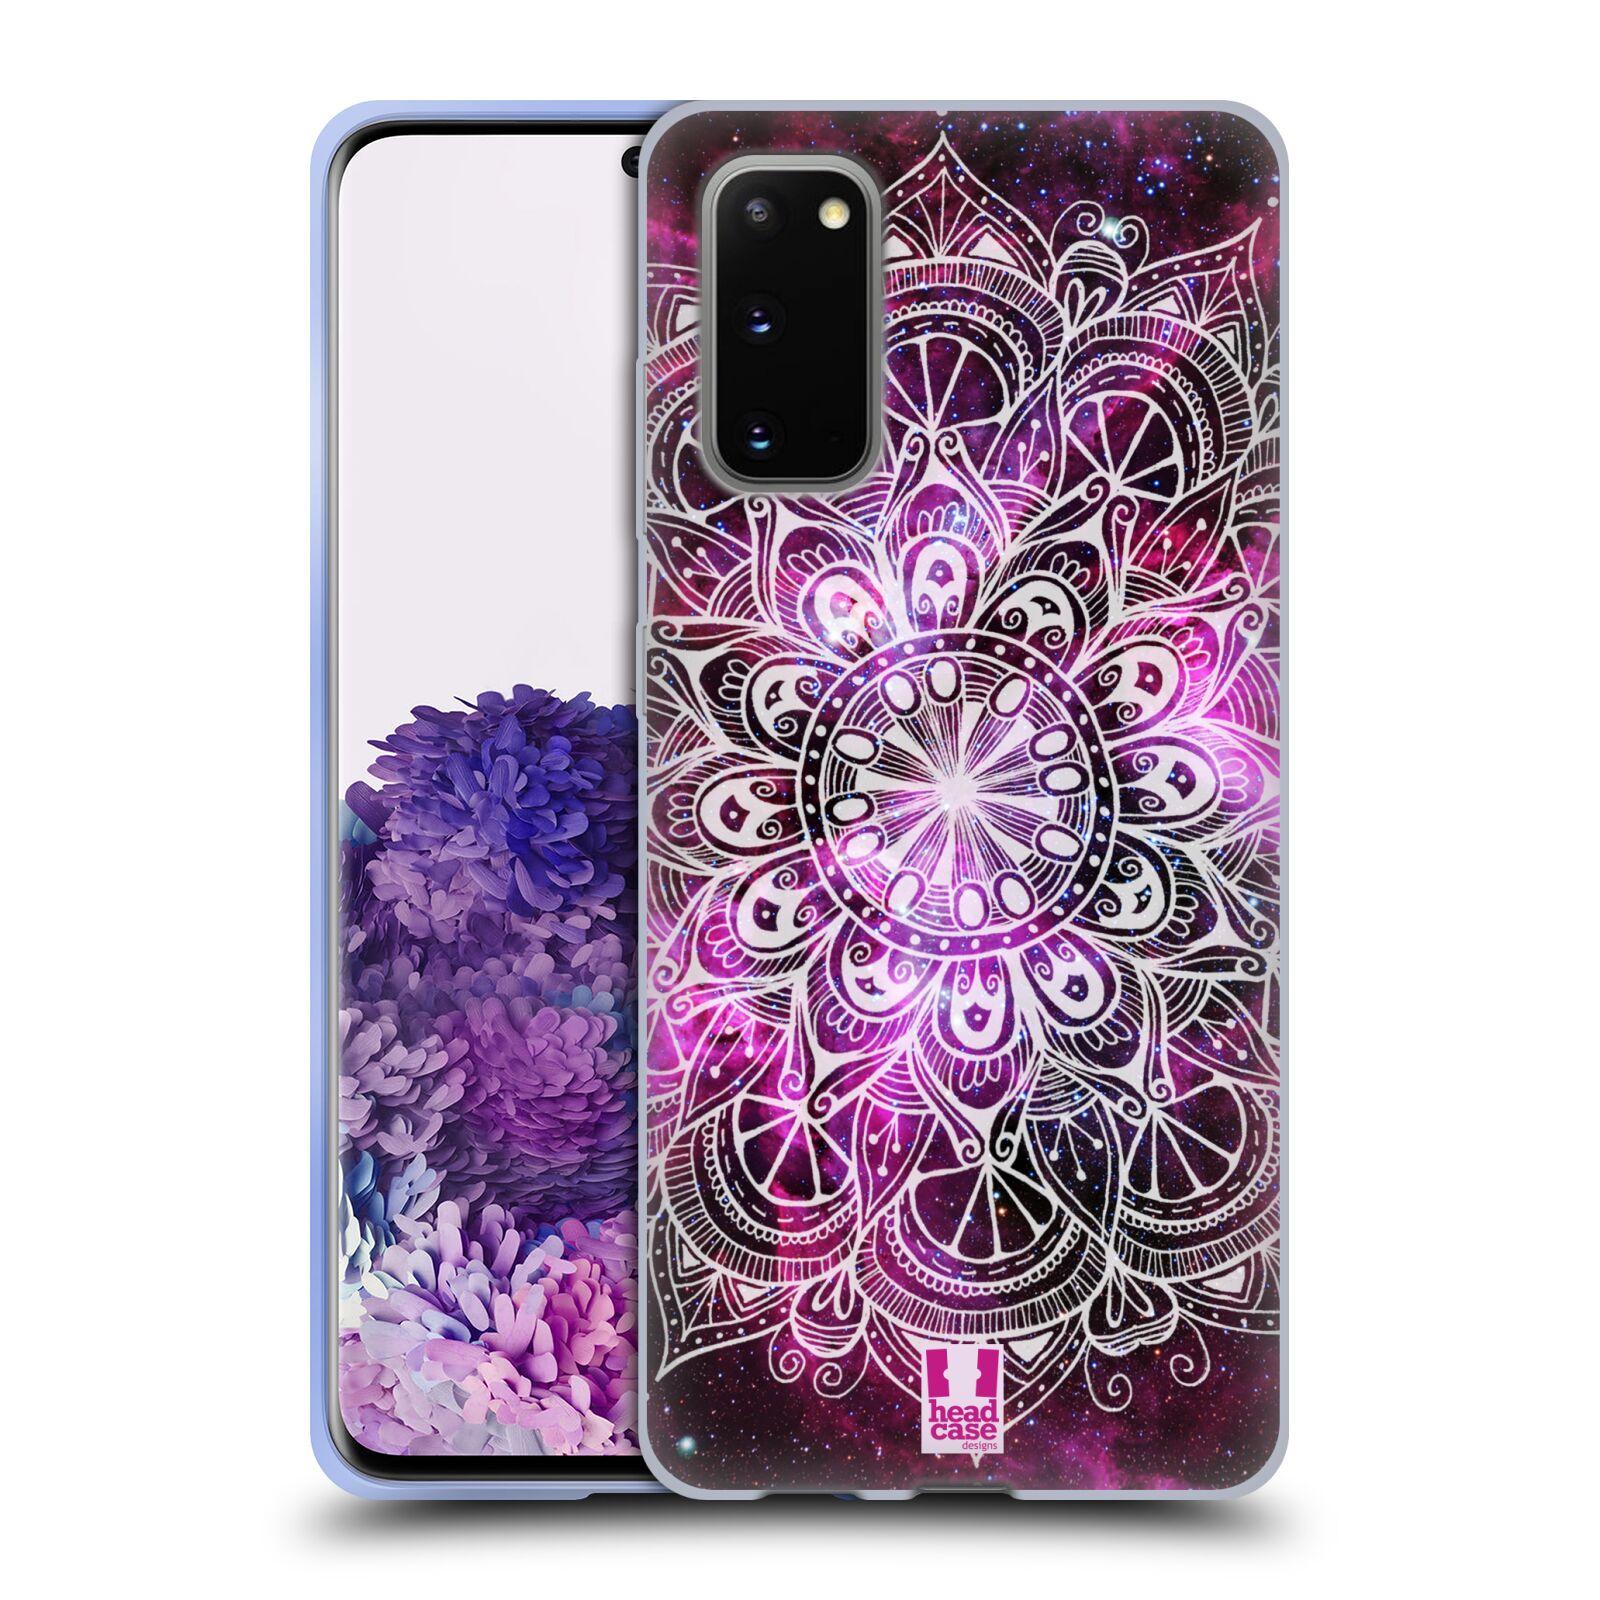 Silikonové pouzdro na mobil Samsung Galaxy S20 - Head Case - Mandala Doodle Nebula